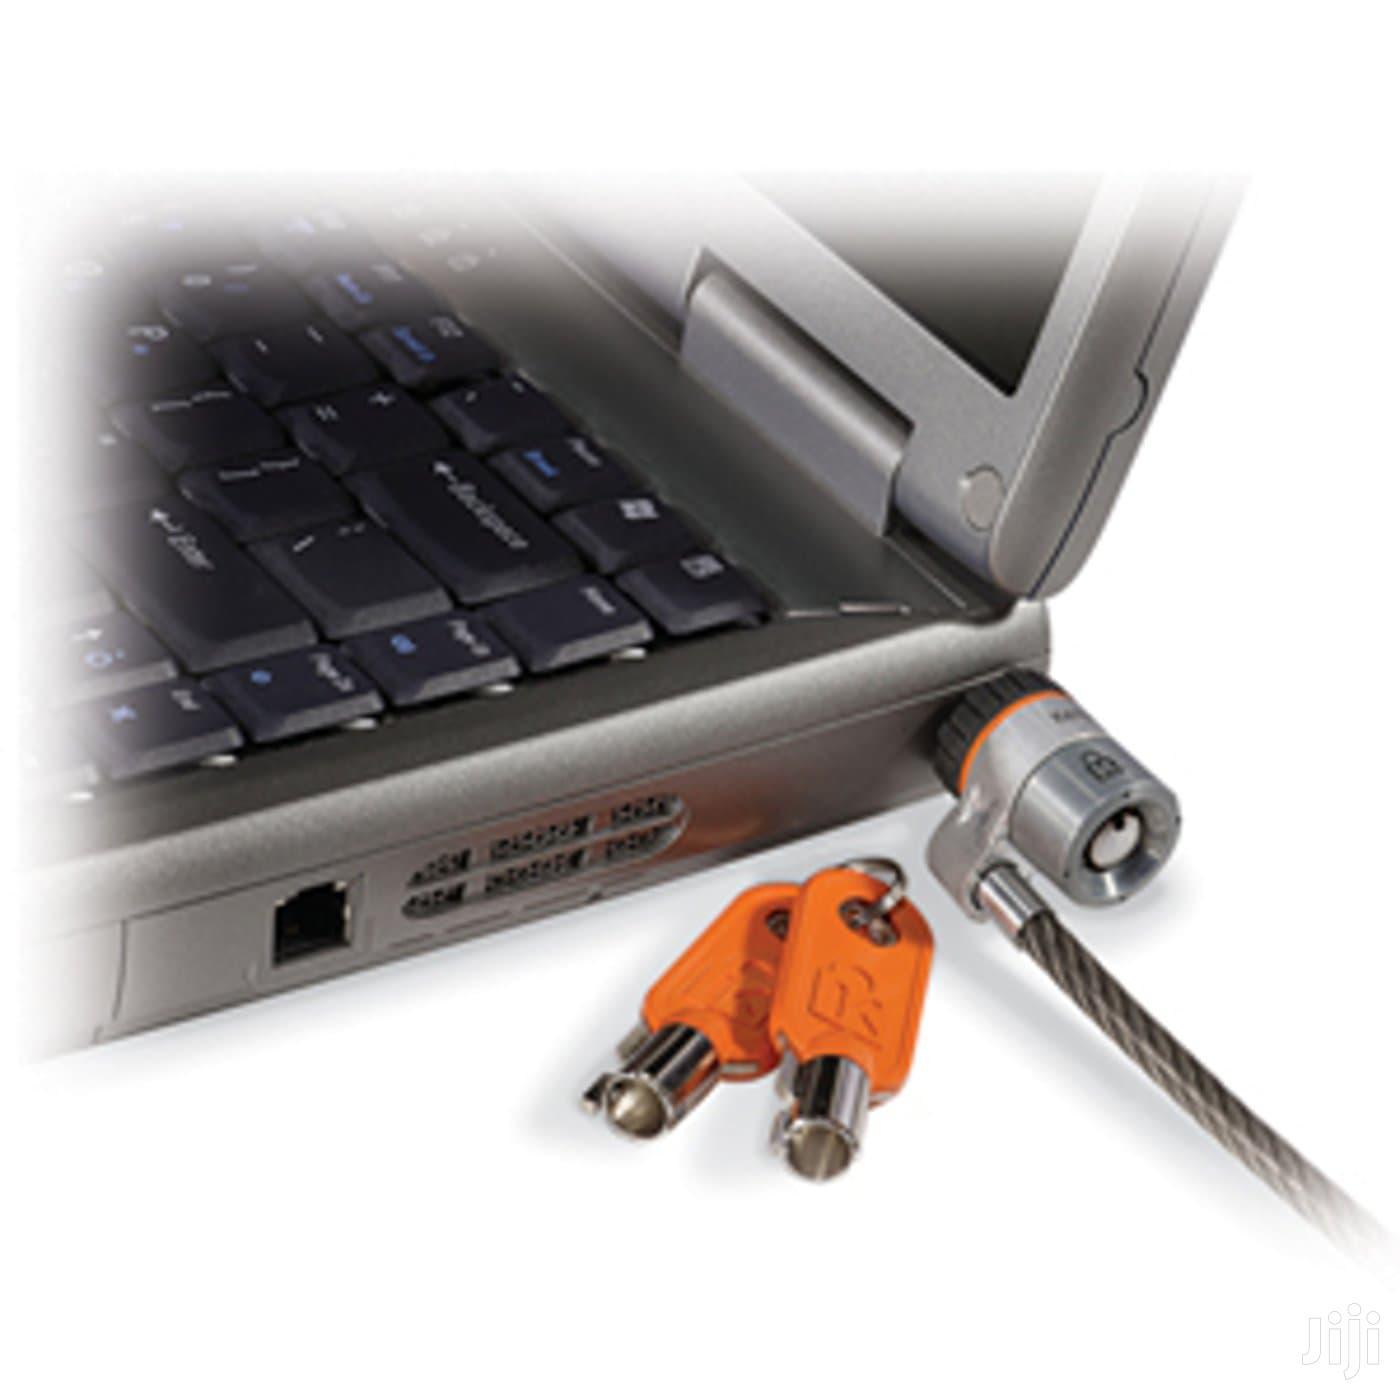 Kensington Microsaver® Notebook Cable Lock